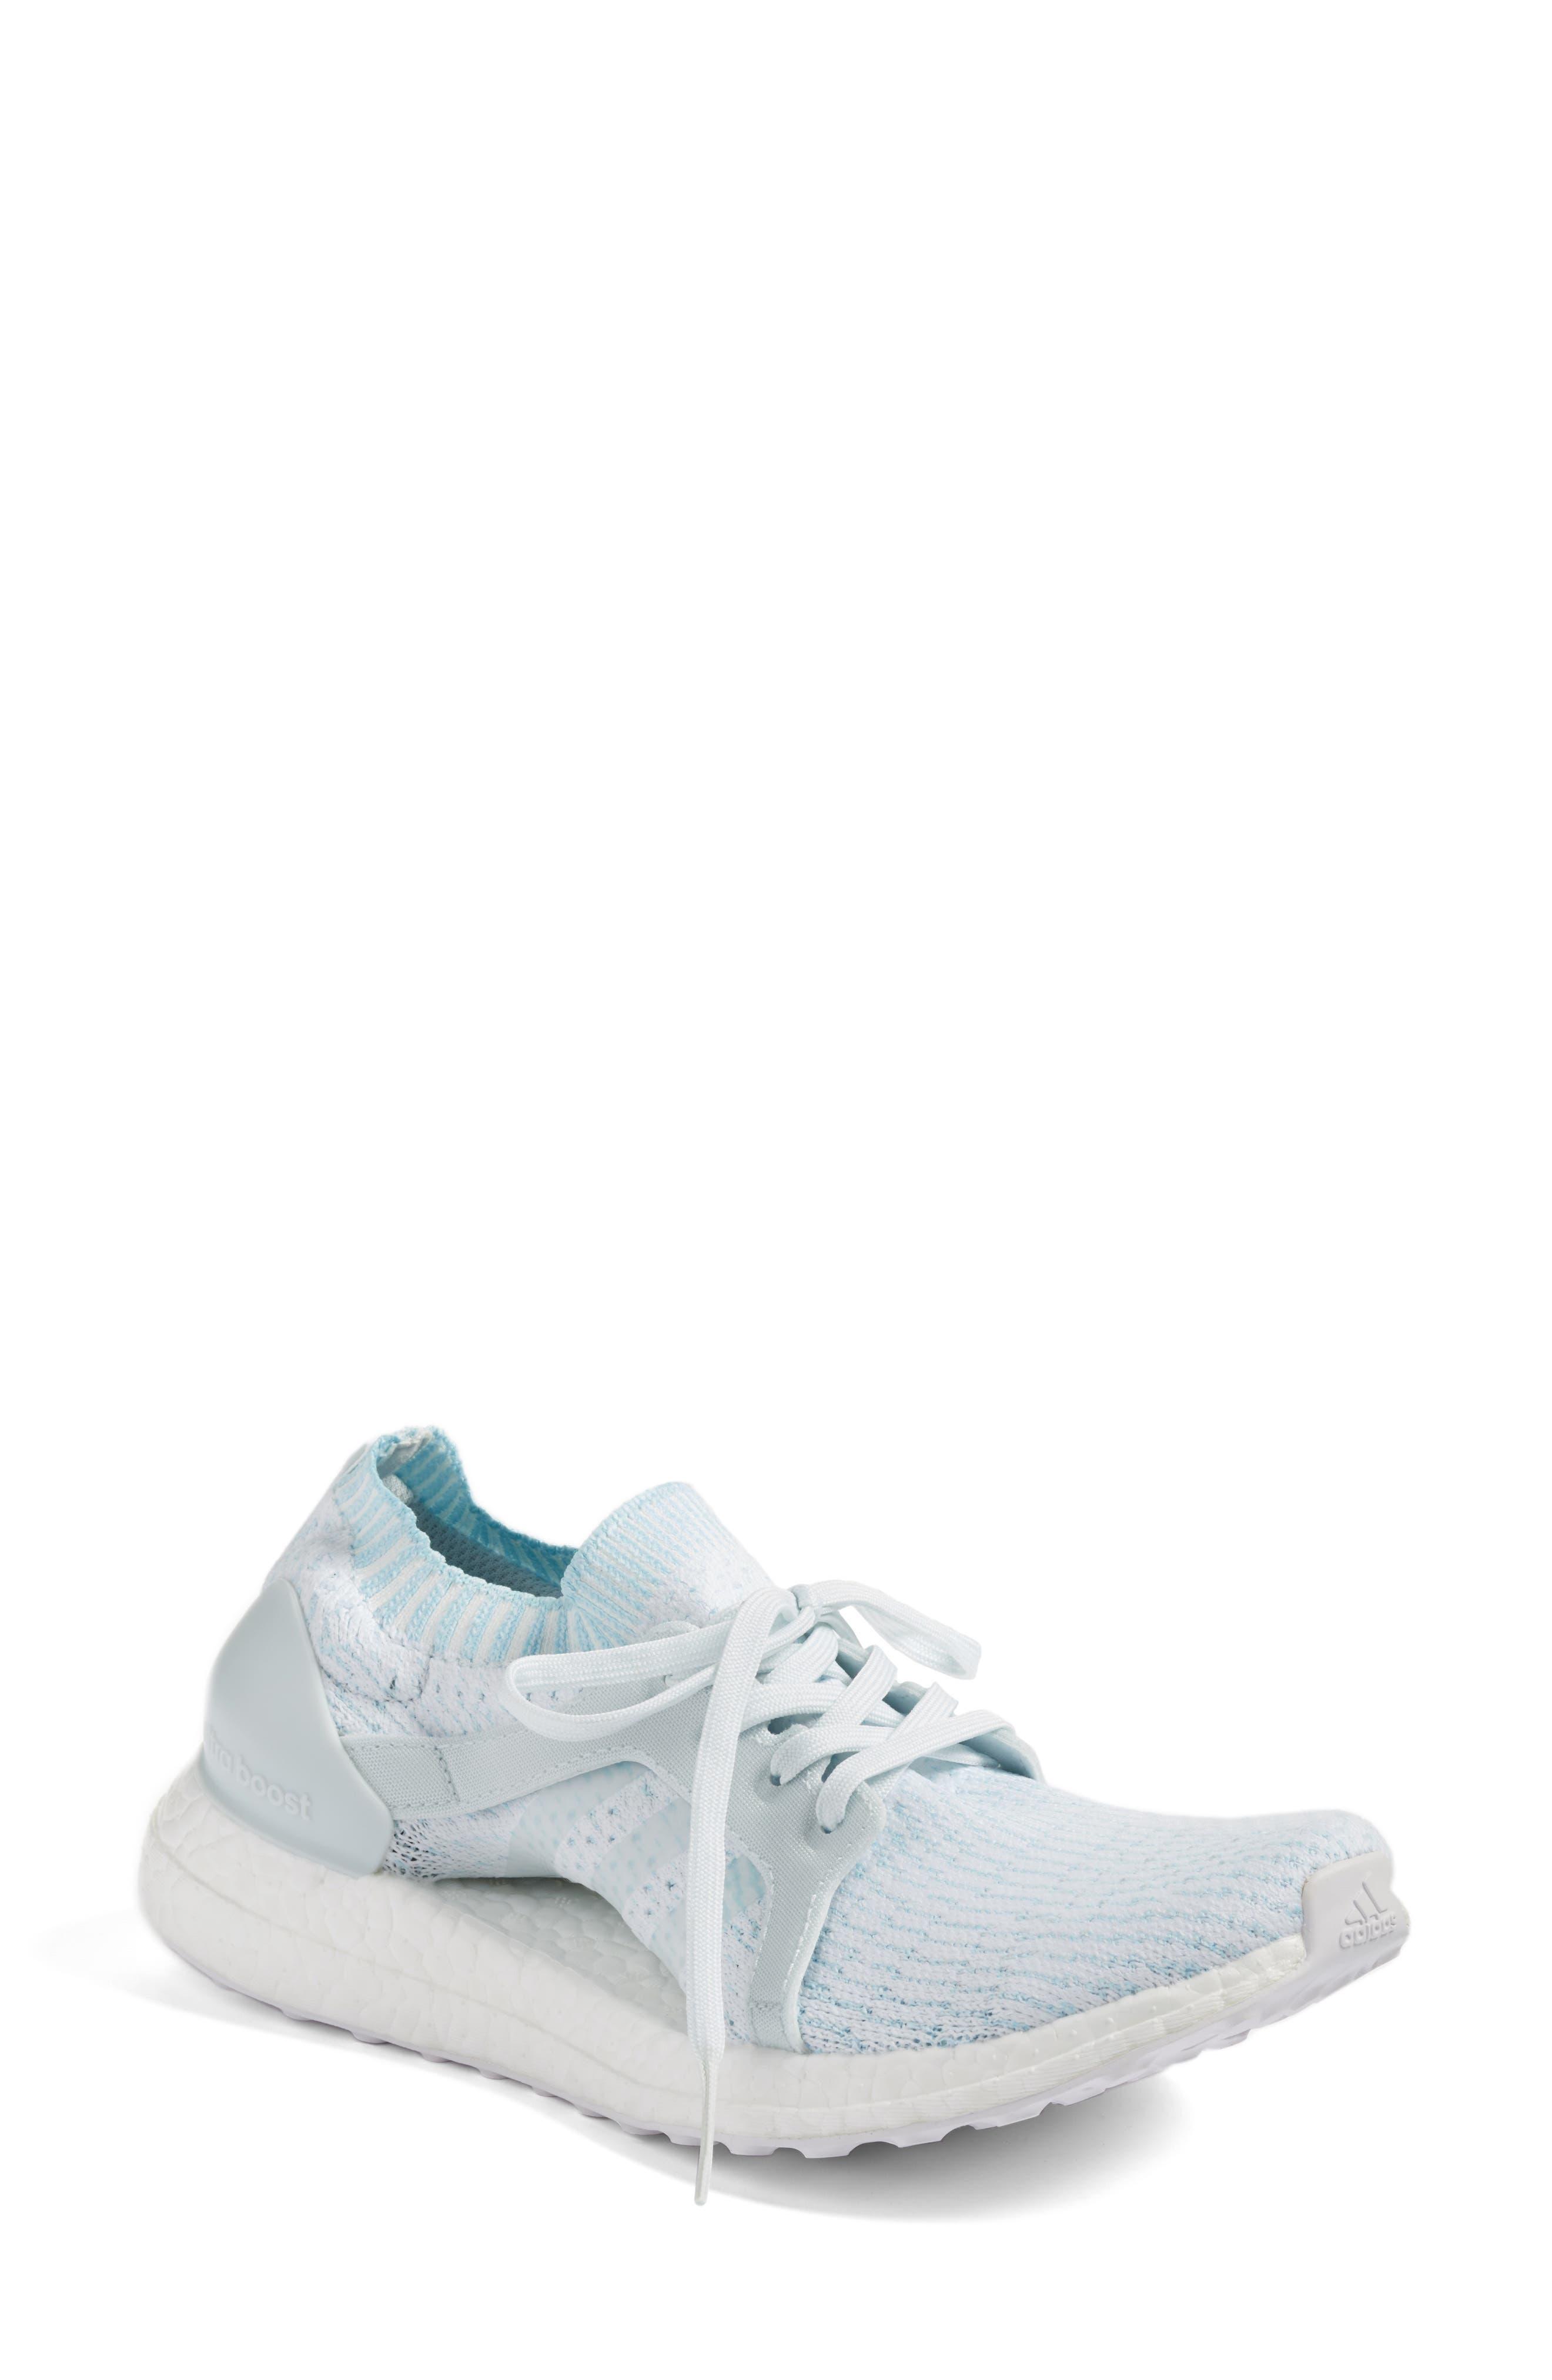 Main Image - adidas Ultraboost x Parley Running Shoe (Women)